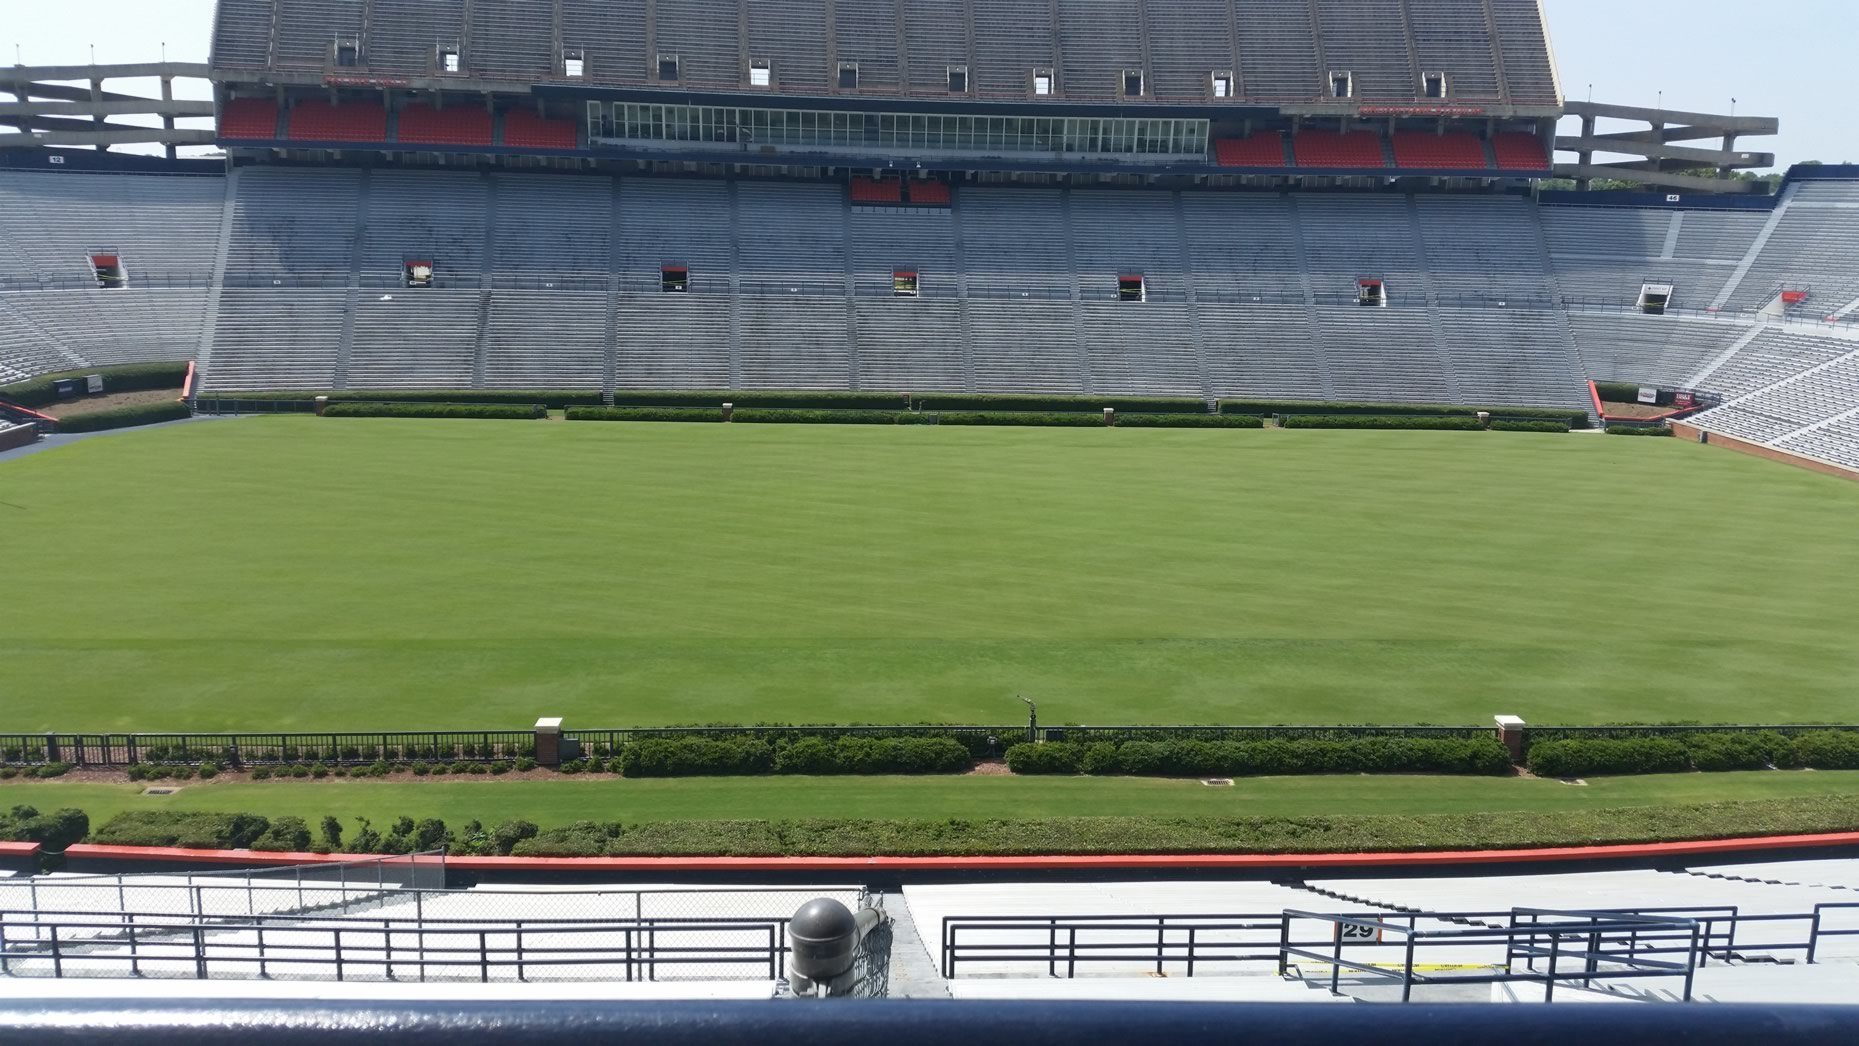 Seat View for Jordan Hare Stadium Nelson Club